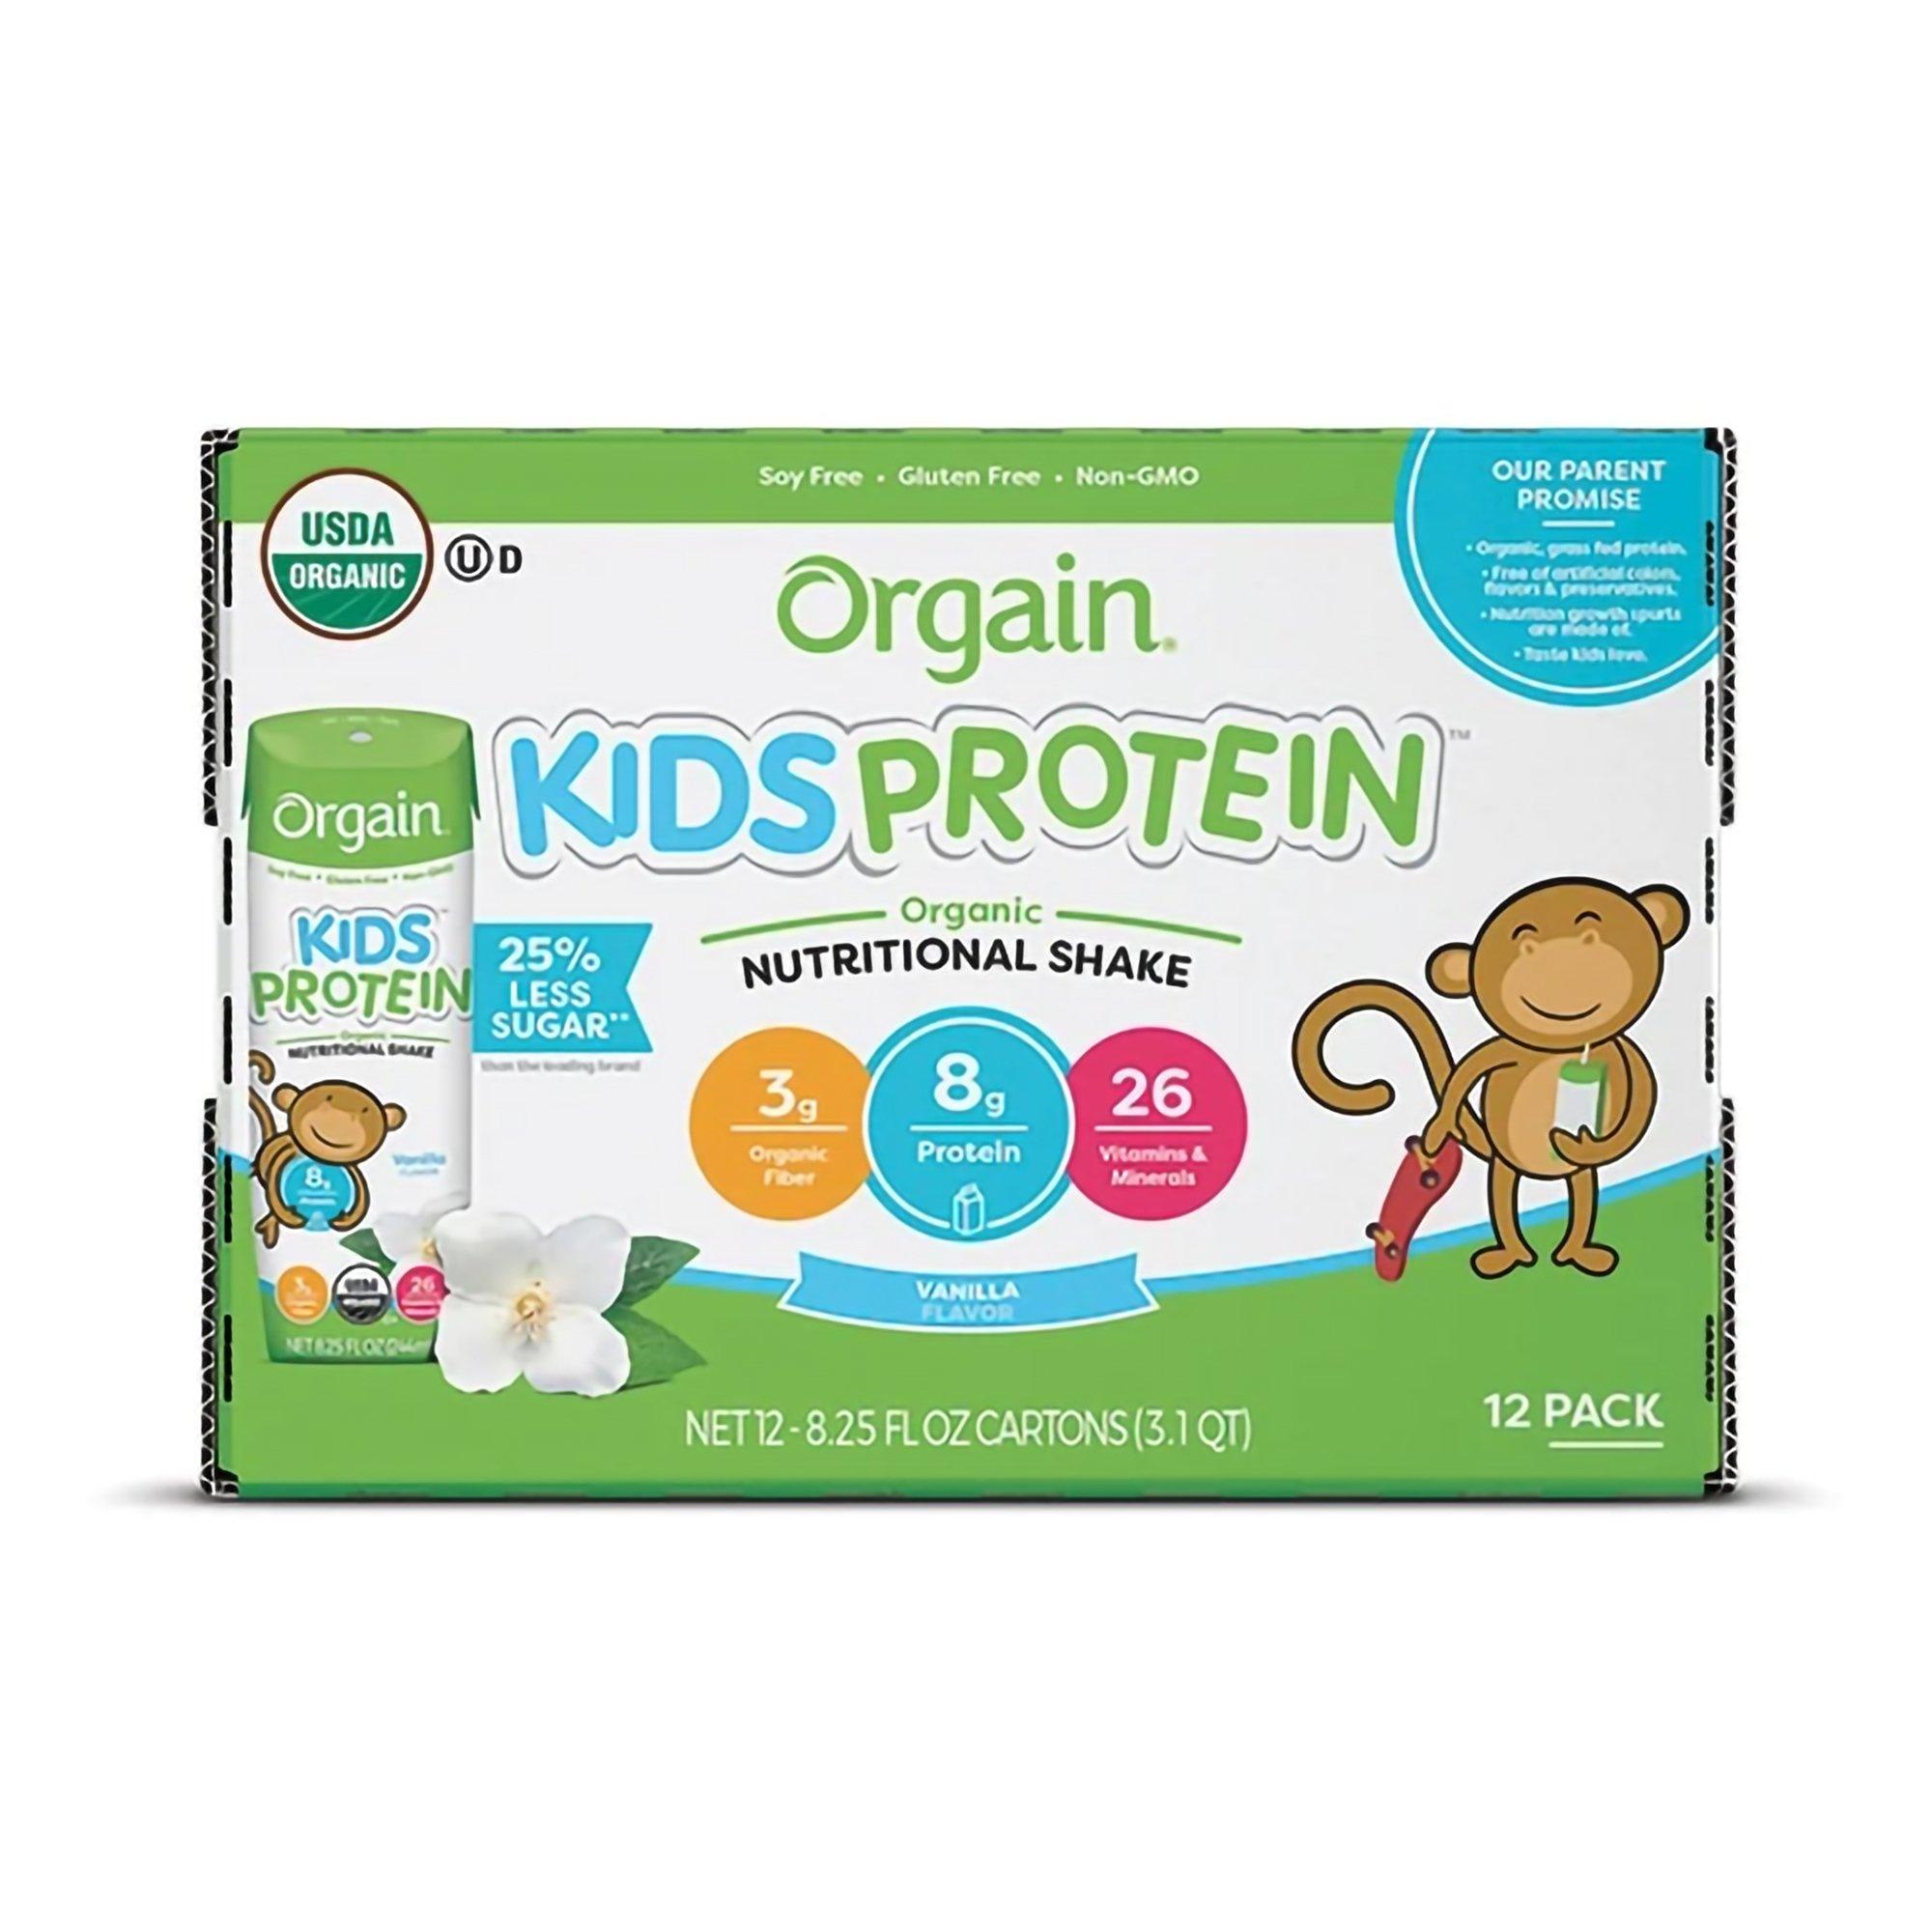 Orgain Kids Protein Organic Nutritional Shake, Vanilla, 8.25 oz., 851770003100, Case of 12